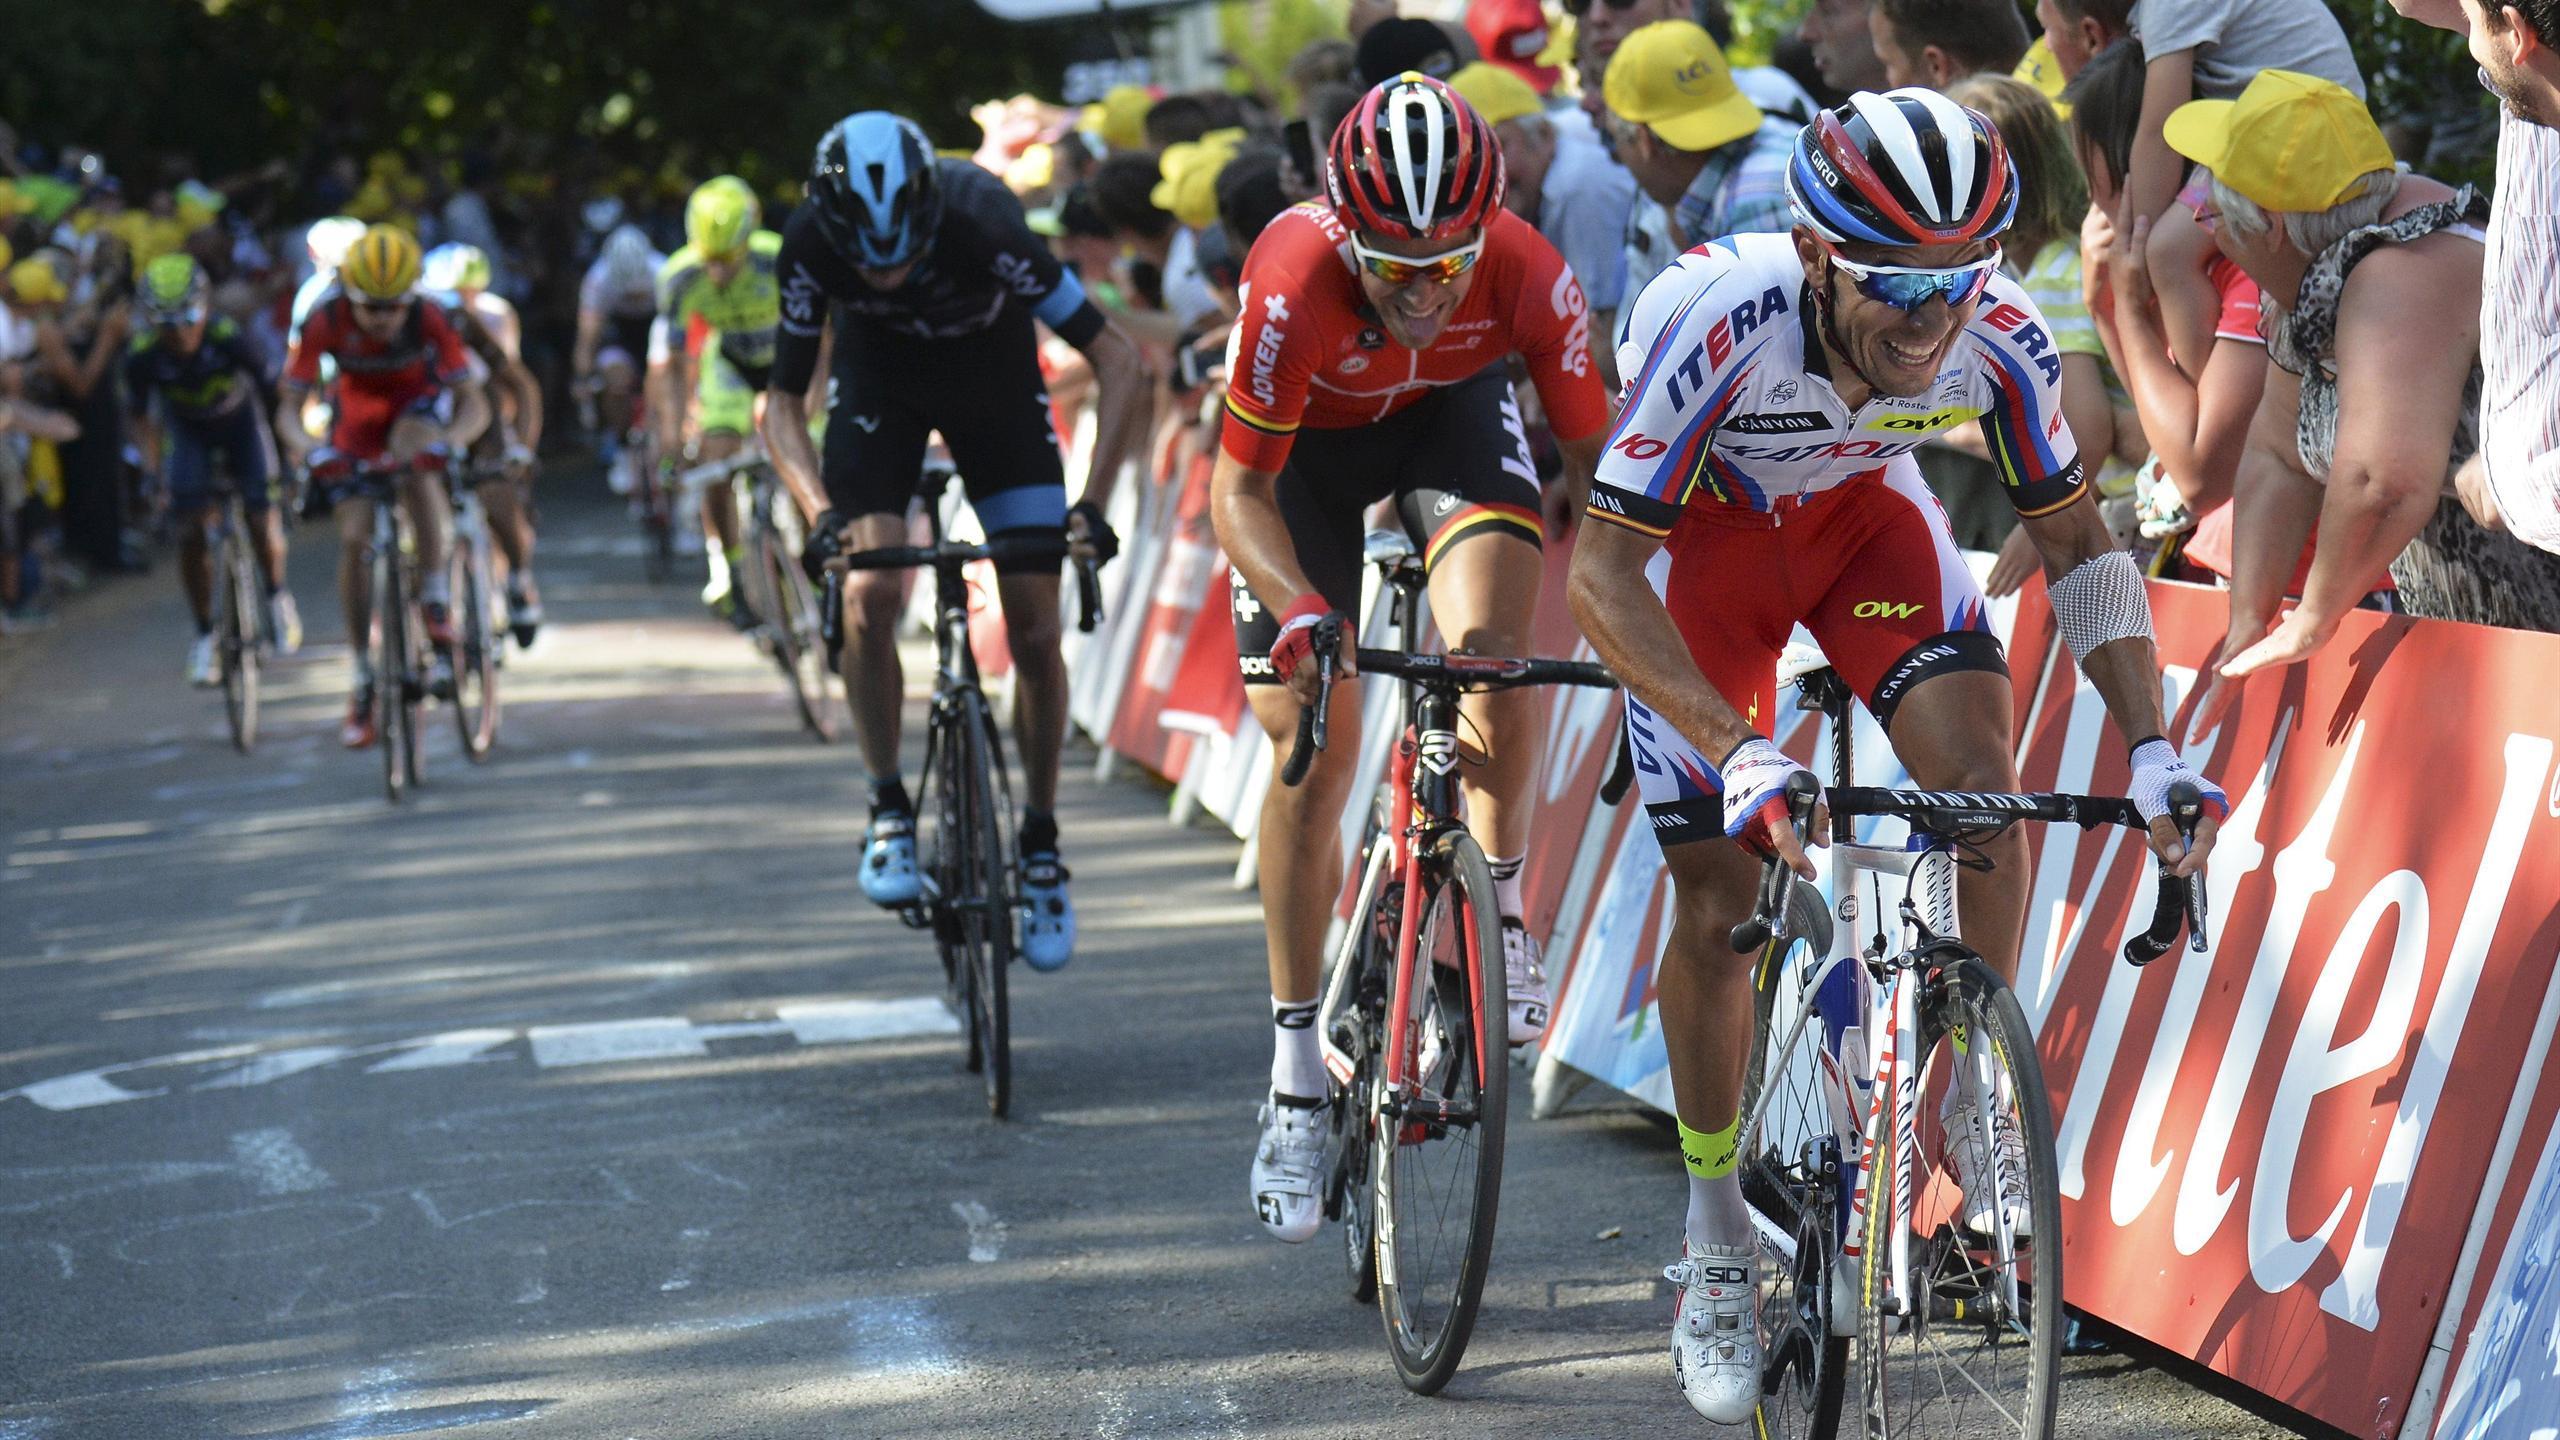 Tony Gallopin (Lotto-Soudal) dans la roue de Joaquim Rodriguez (Katusha) dans le Mur de Huy, arrivée de la 3e étape du Toru de France 2015